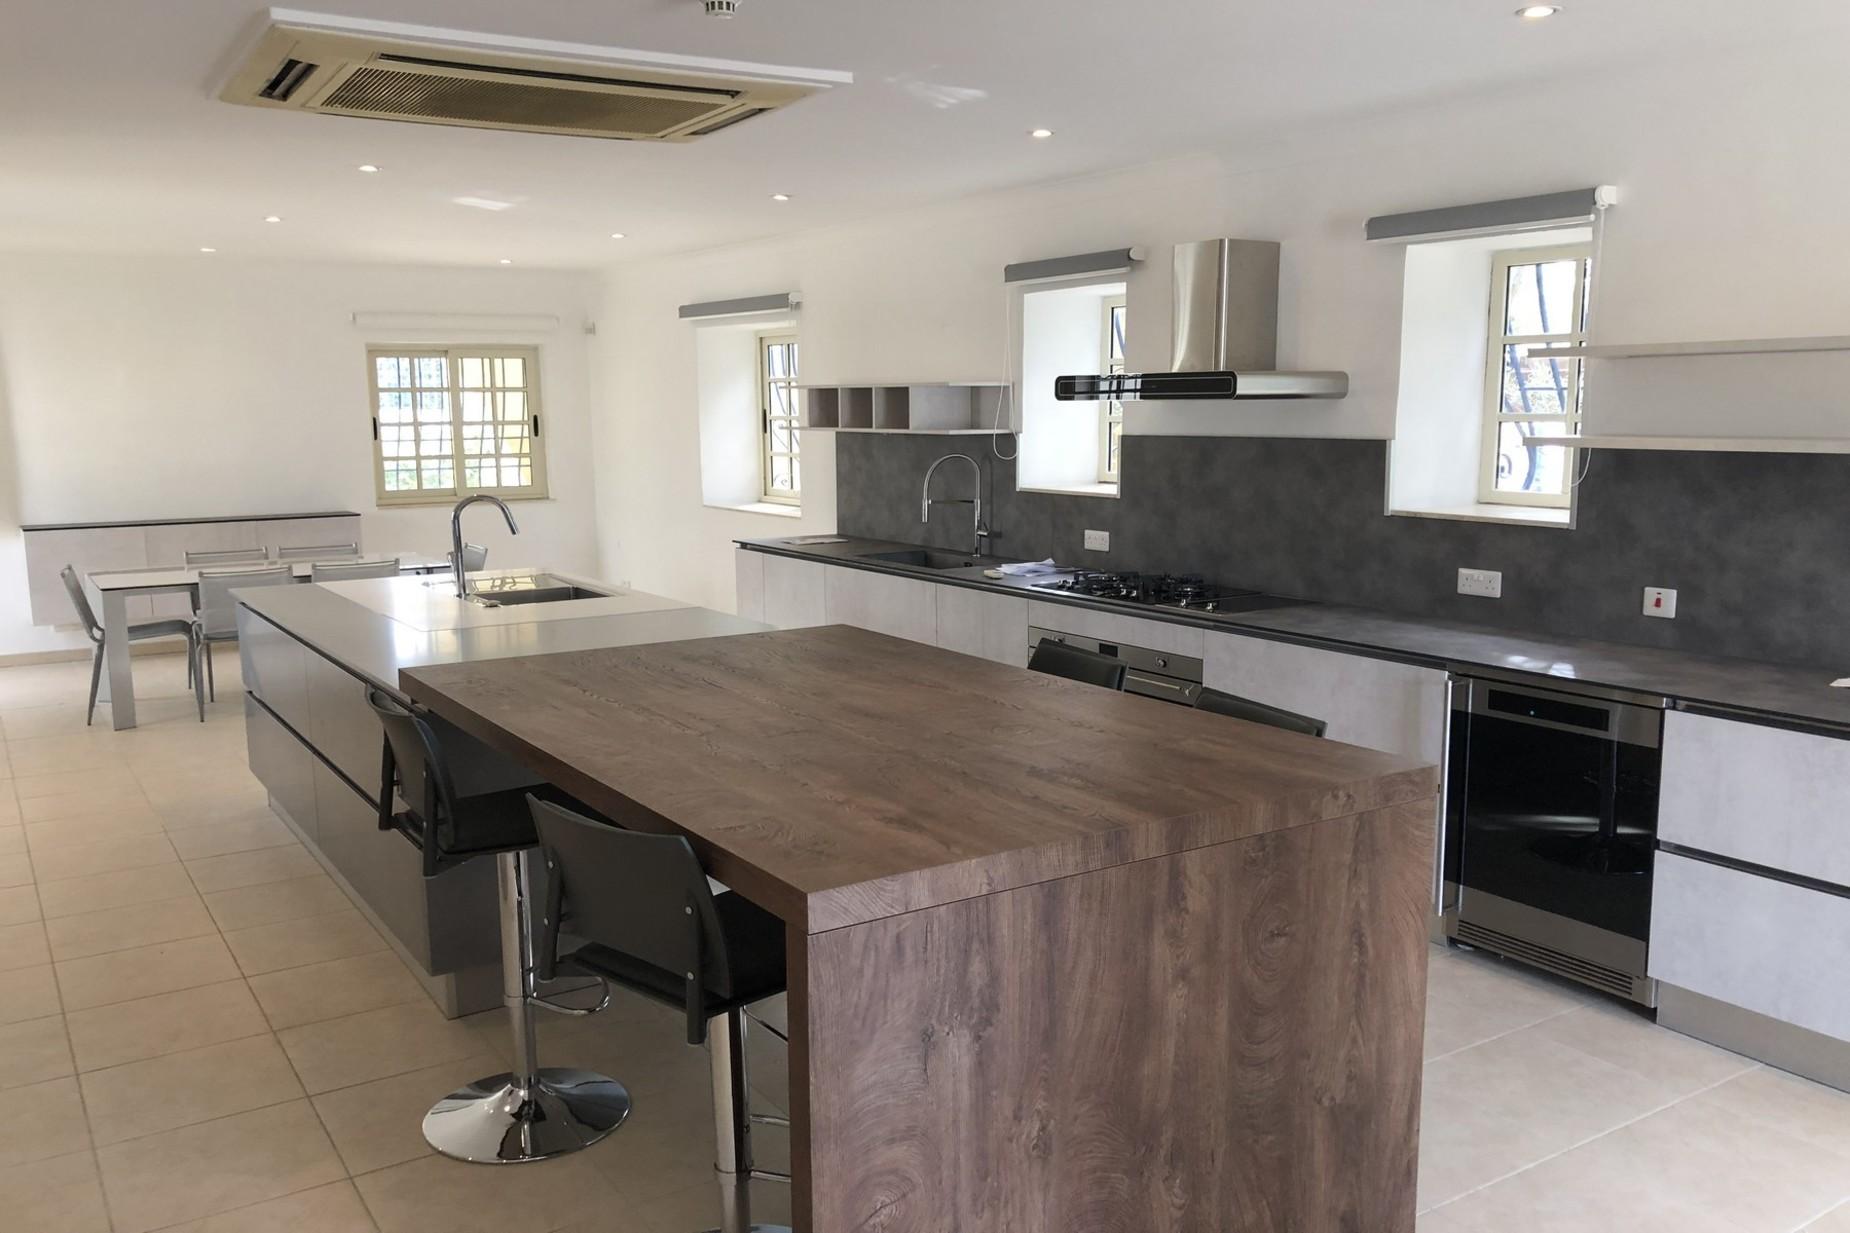 5 bed Villa For Rent in Naxxar, Naxxar - thumb 3